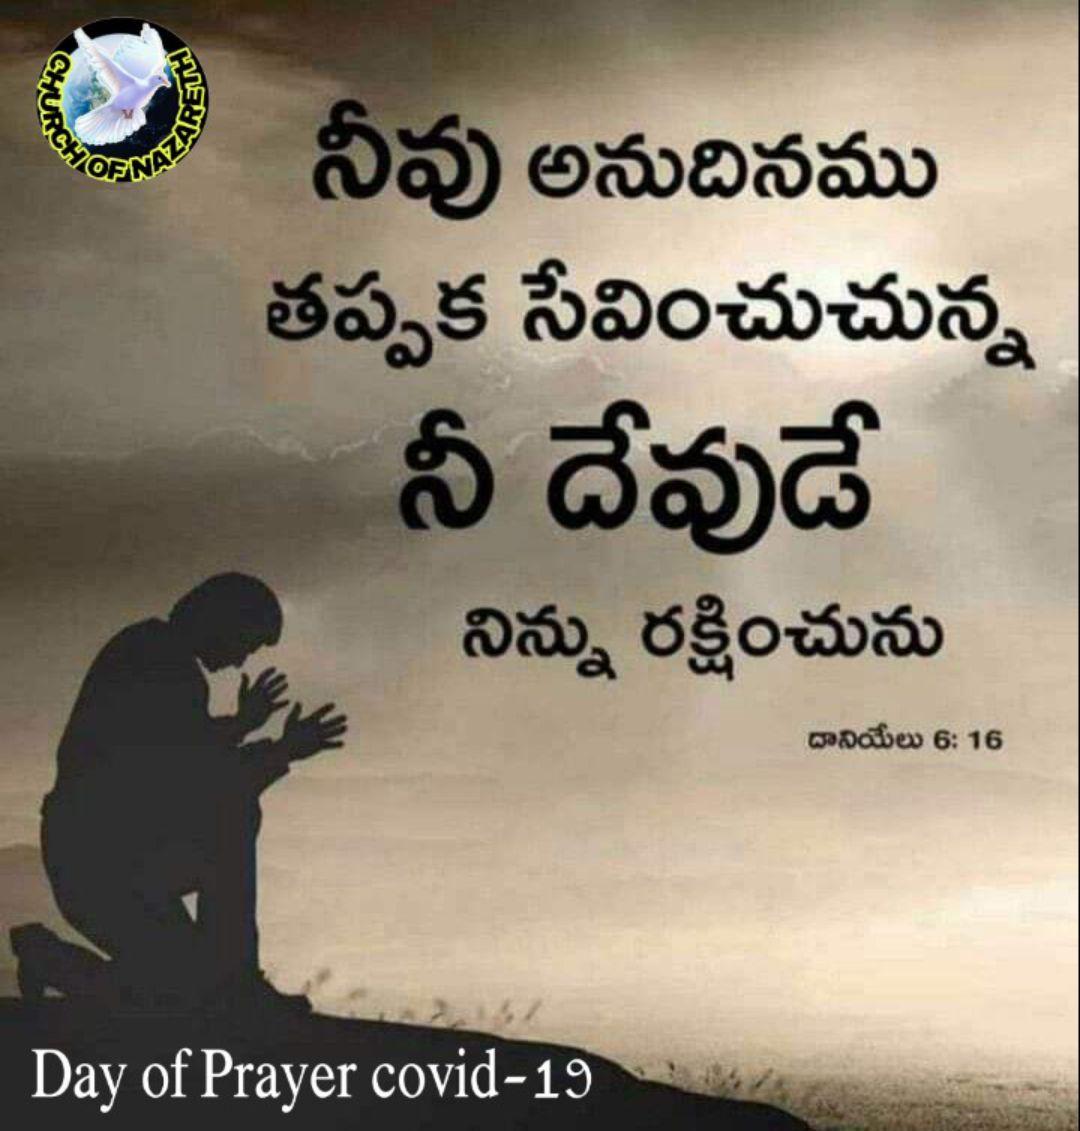 amen...... - CHURG SER నీవు అనుదినము తప్పక సేవించుచున్న నీ దేవుడే నిన్ను రక్షించును దానియేలు 6 : 16 Day of Prayer covid - 19 - ShareChat